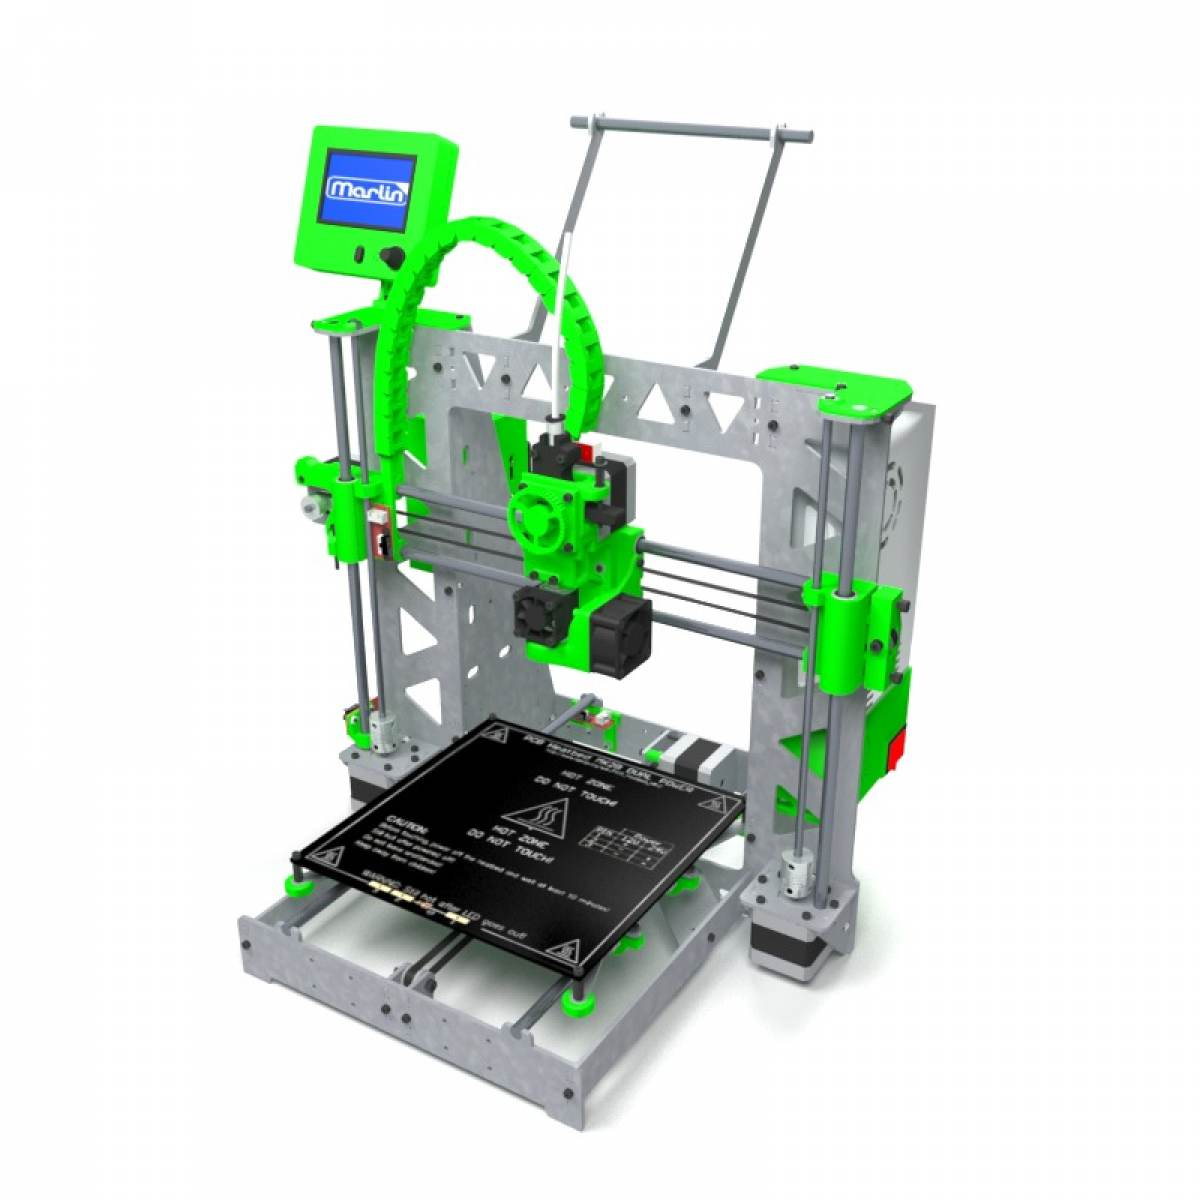 P3STEEL por HTA3D - Kit DIY personalizable - HTA3D